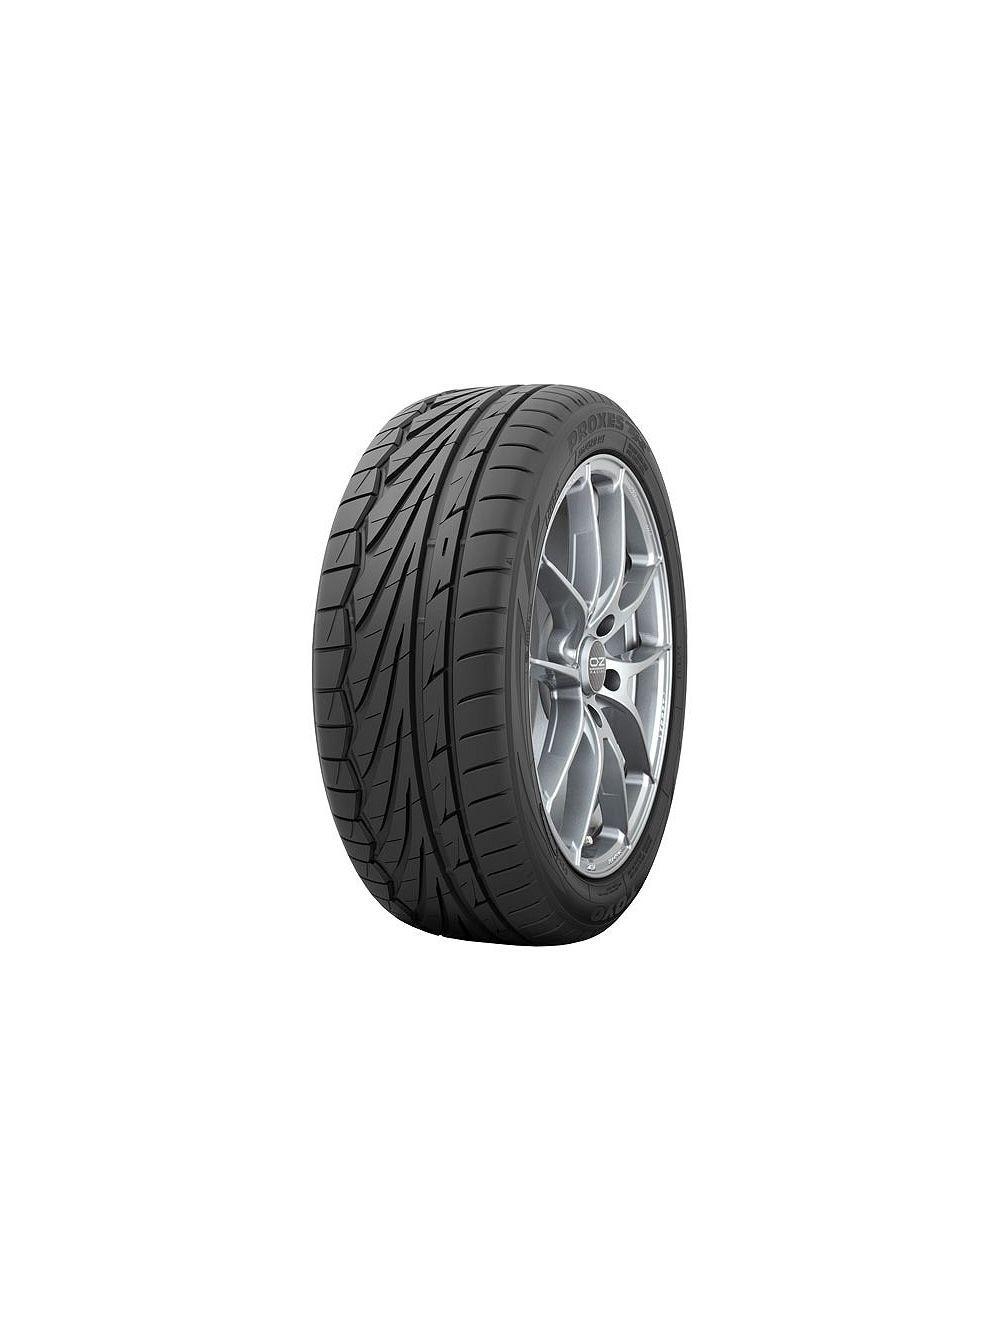 Toyo 245/40R18 W TR1 Proxes XL Nyári gumi